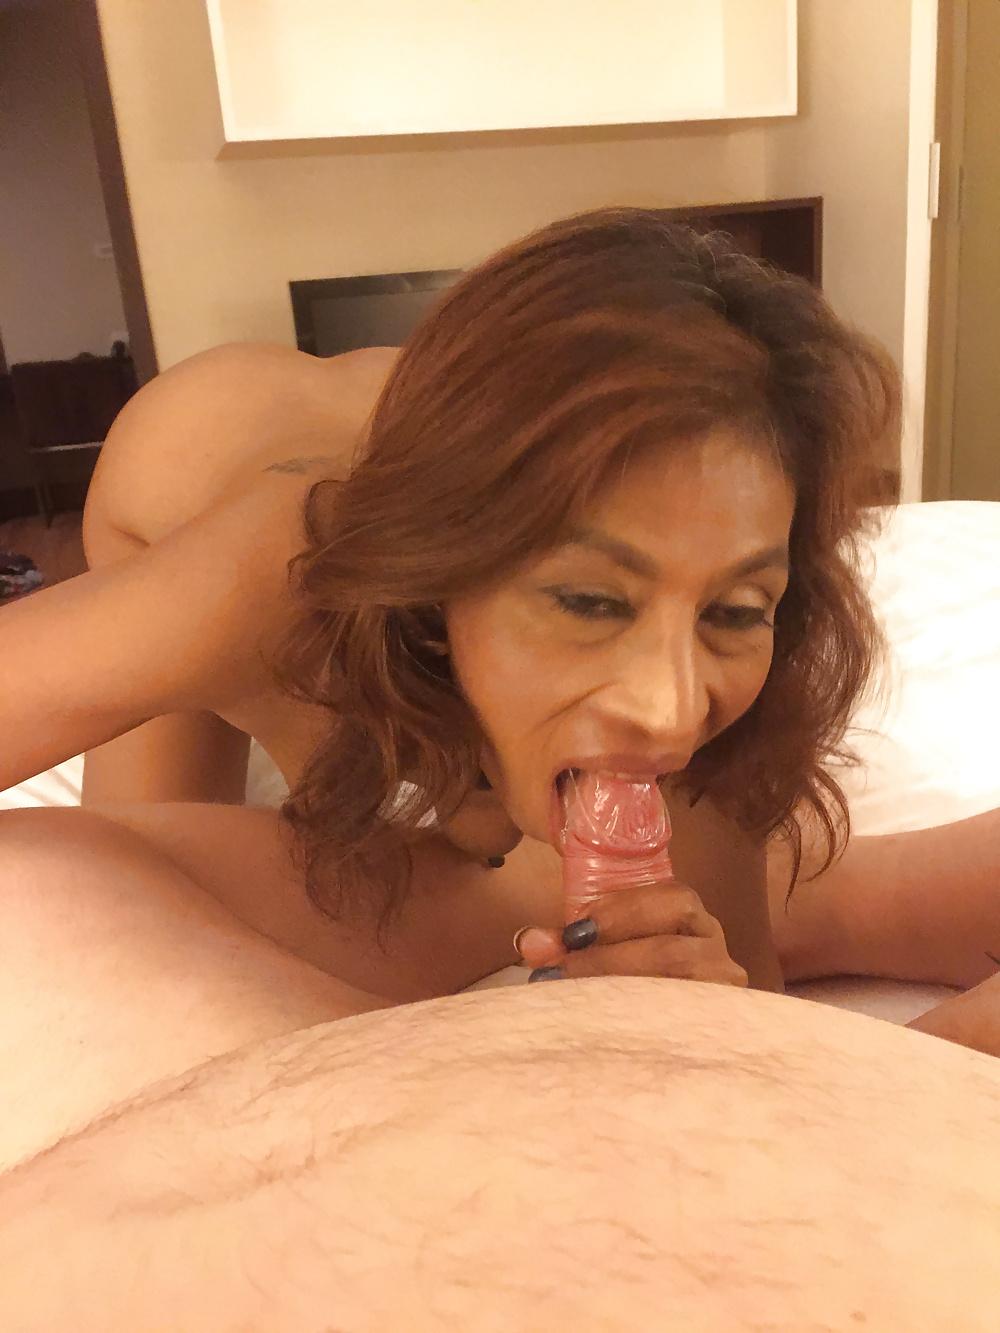 Asian laos hot girl fucked